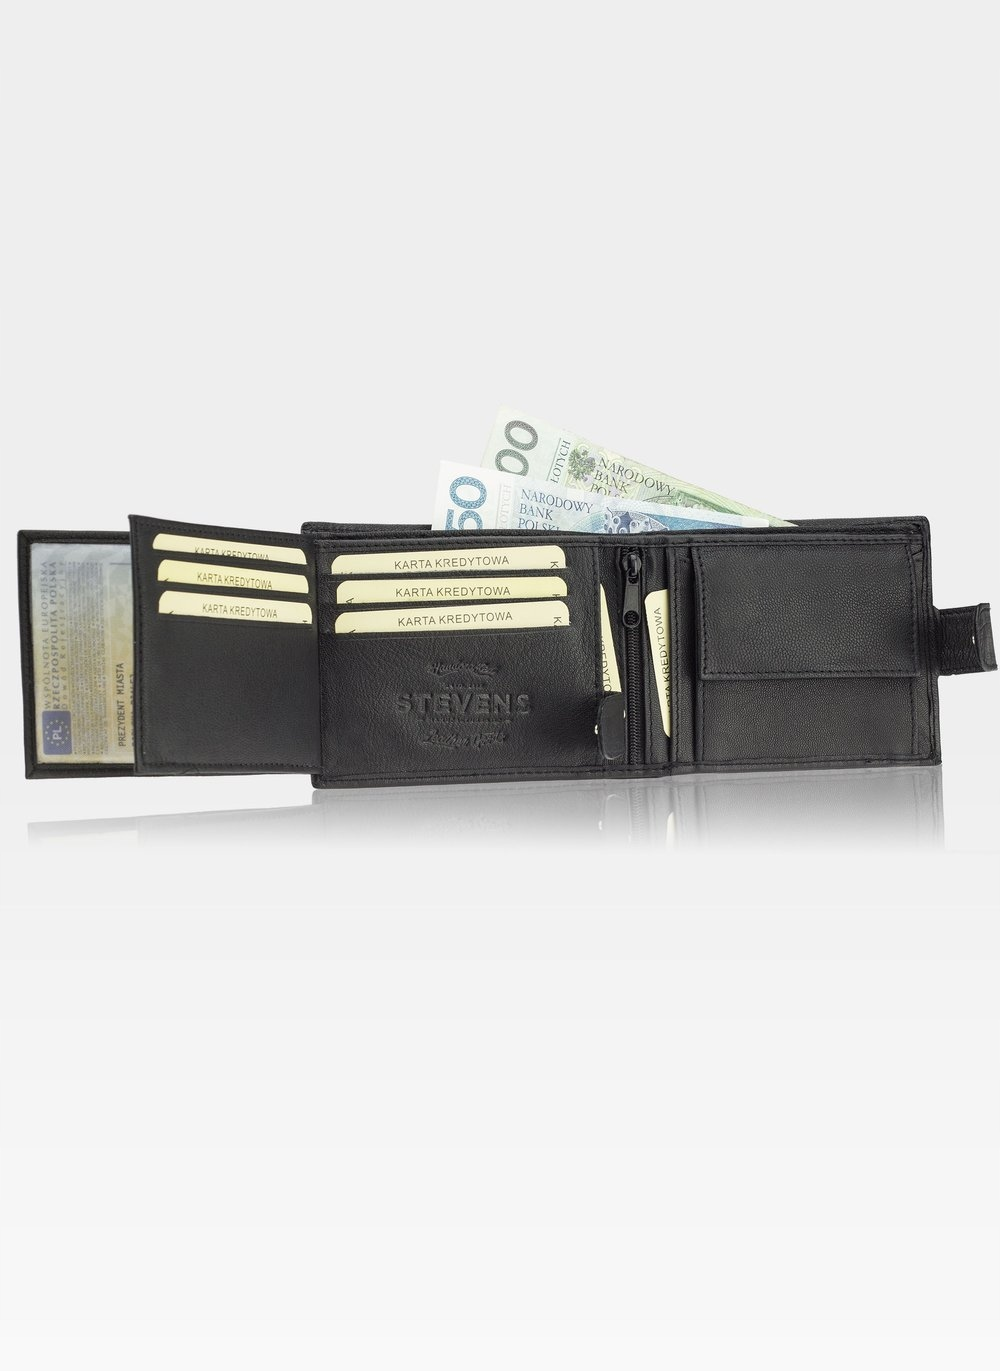 STEVENS GIFT SET Wallet Men's Leather Belt Additional features none